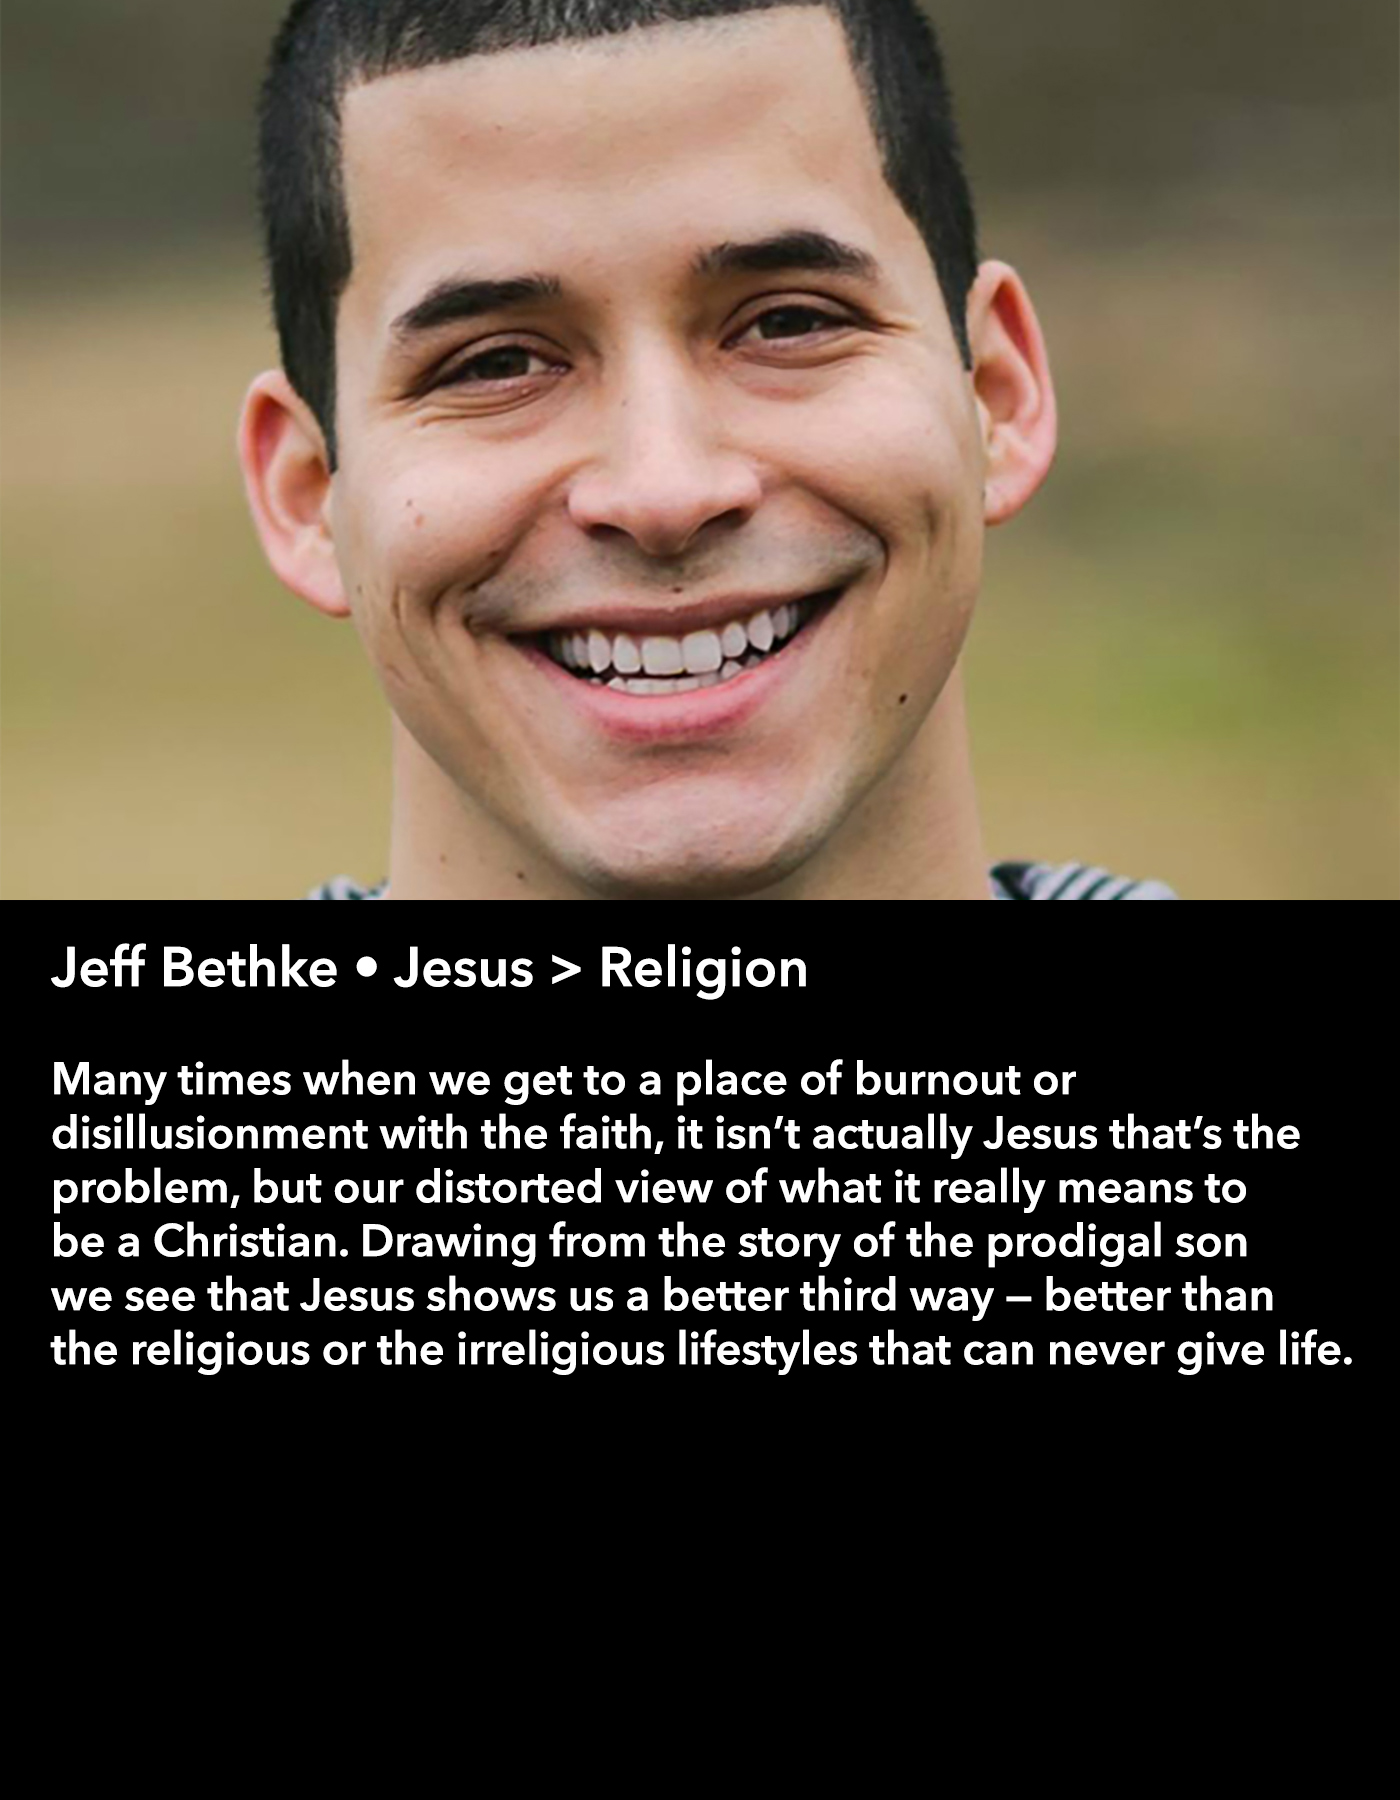 Jeff Bethke • Jesus > Religion • Thursday Night, March 16 • 8:30 pm – 9:45 pm